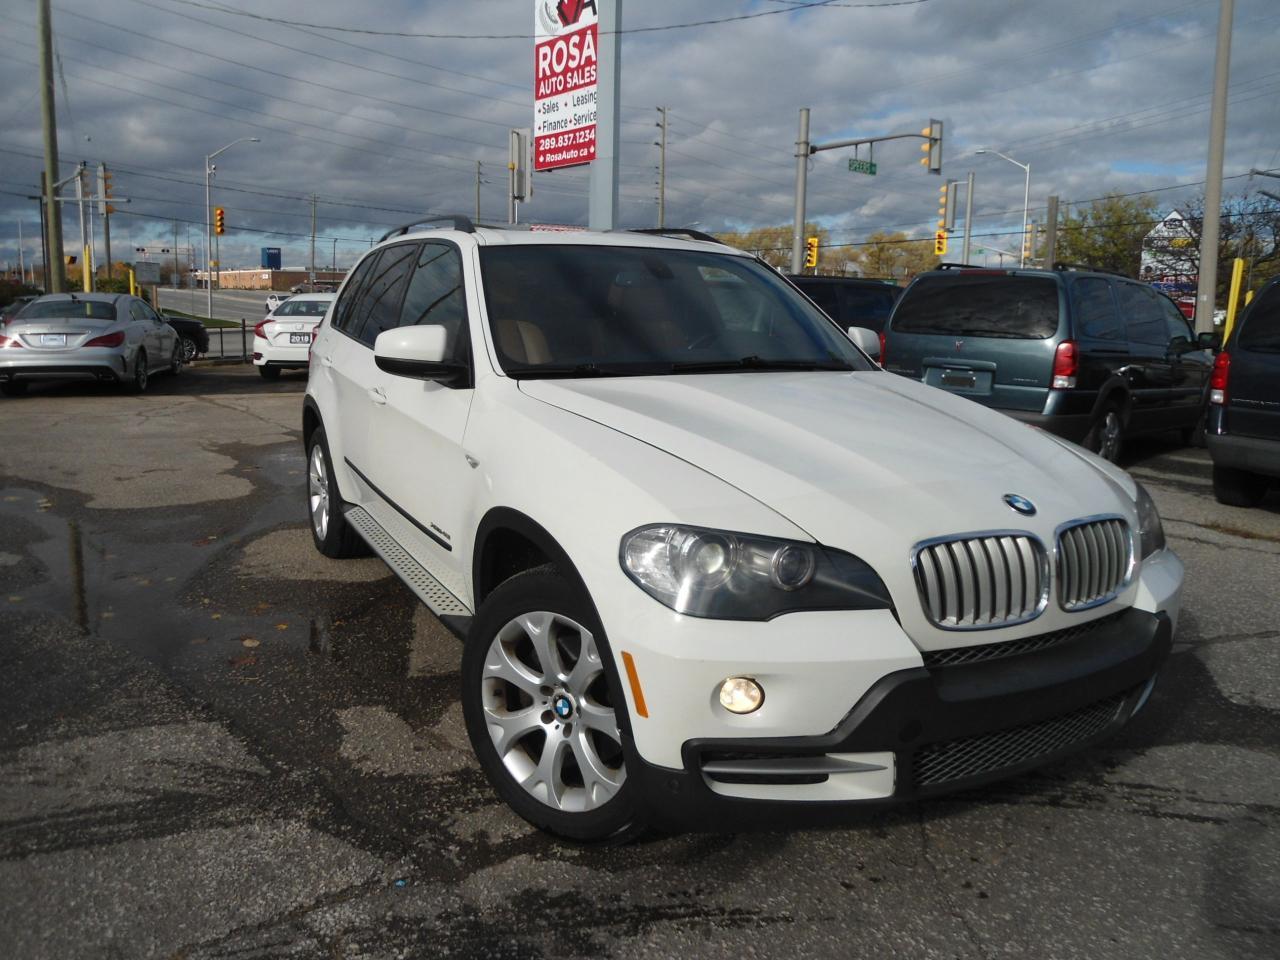 2009 BMW X5 4.8 7 PASSENGER NAVIG B-TOOTH BACK UP PANORAMIC AC